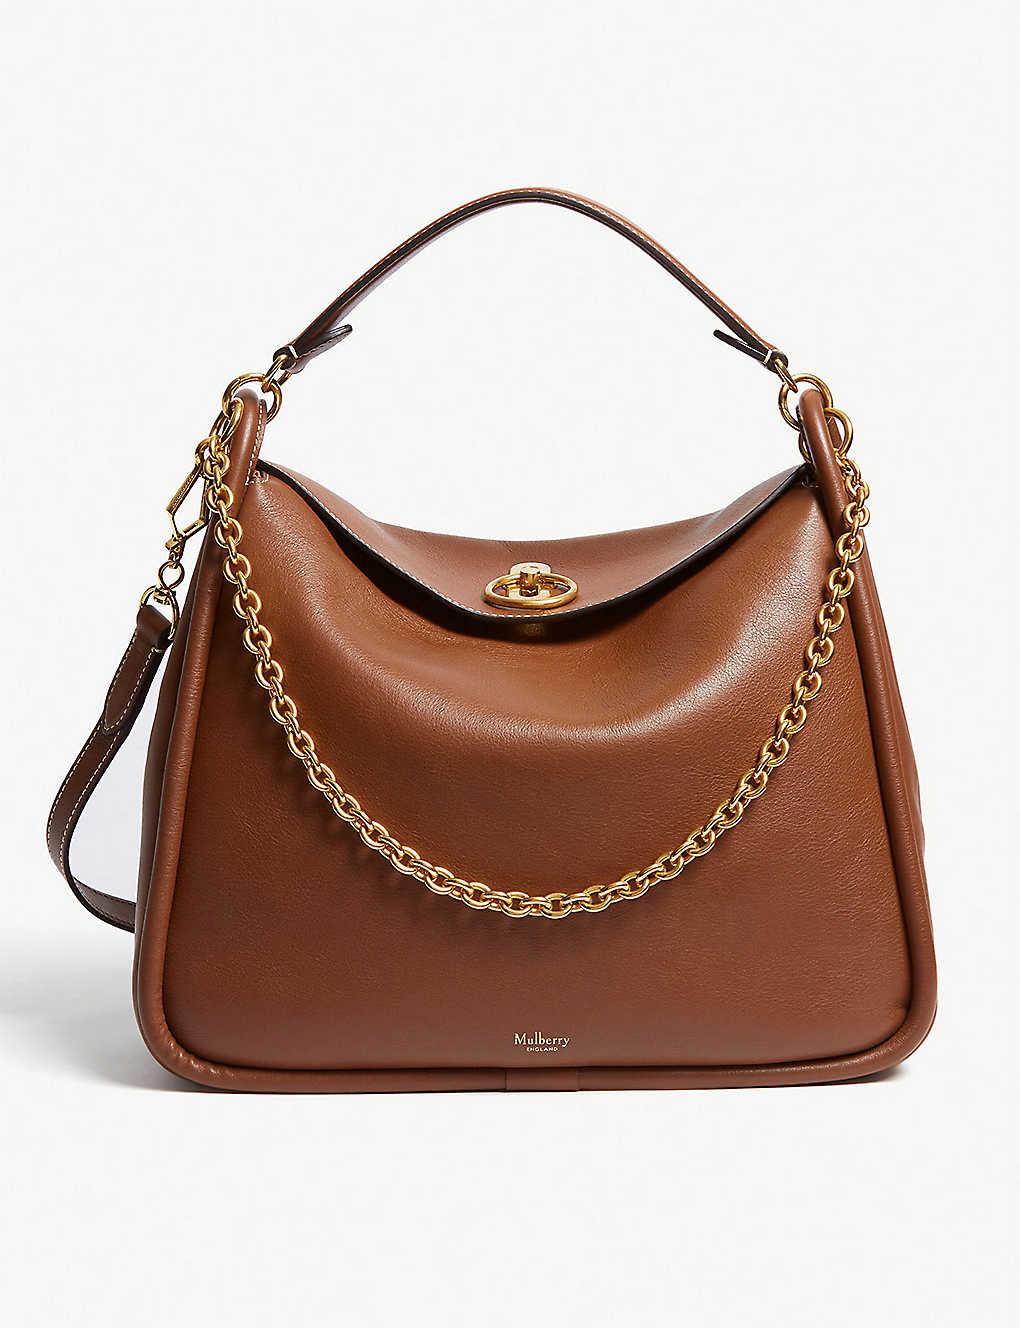 0a791d8bc7 MULBERRY - Leighton handbag | Selfridges.com